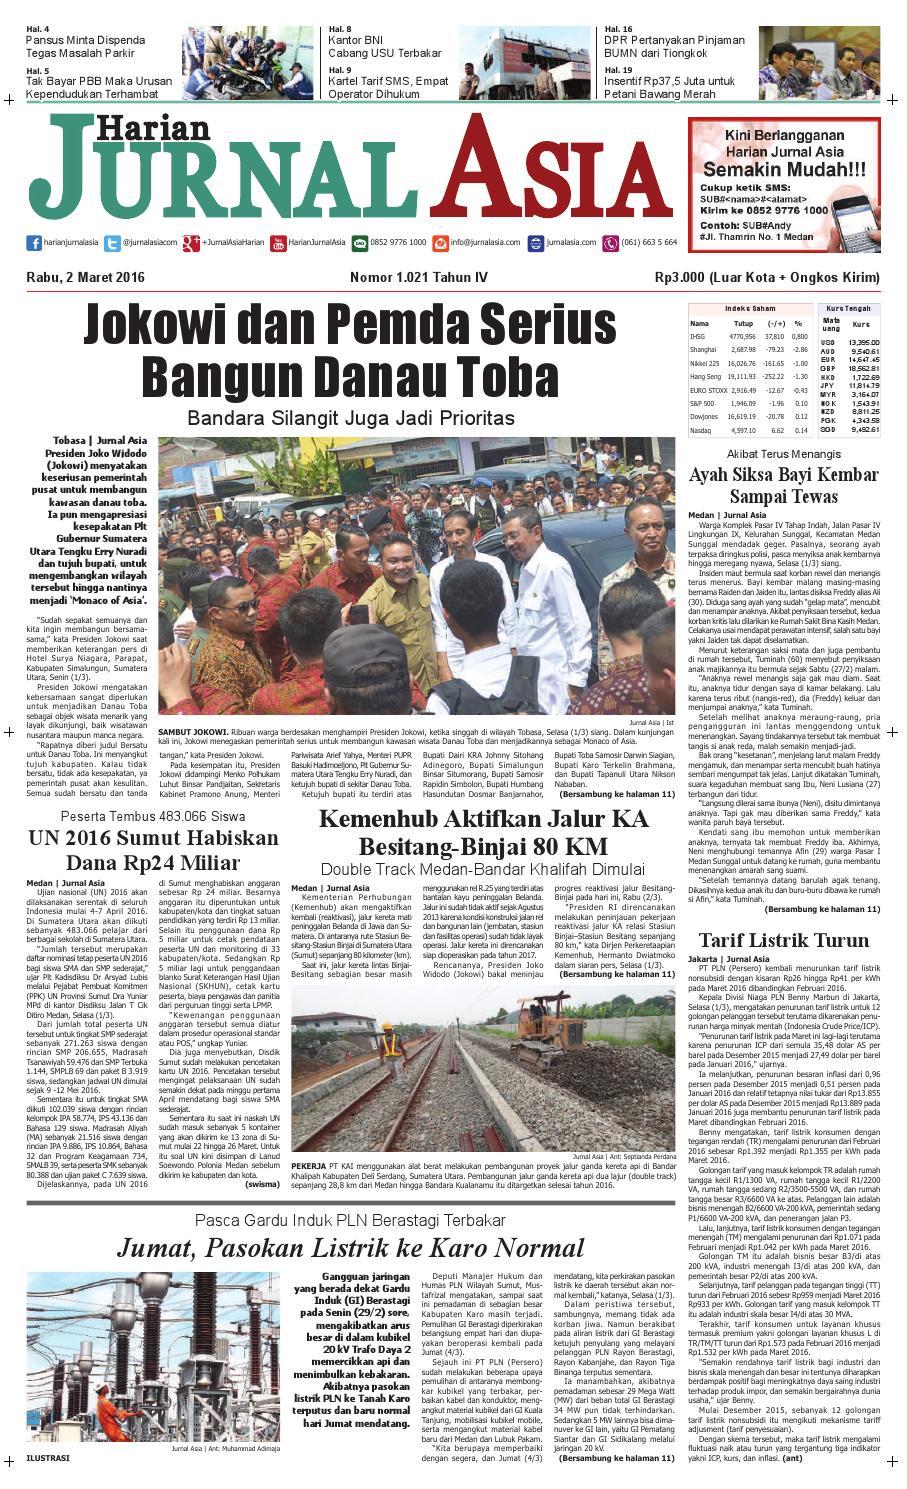 Harian Jurnal Asia Edisi Rabu 02 Maret 2016 By Produk Ukm Bumn Tempat Tisu Handmade Trenggalek Medan Issuu